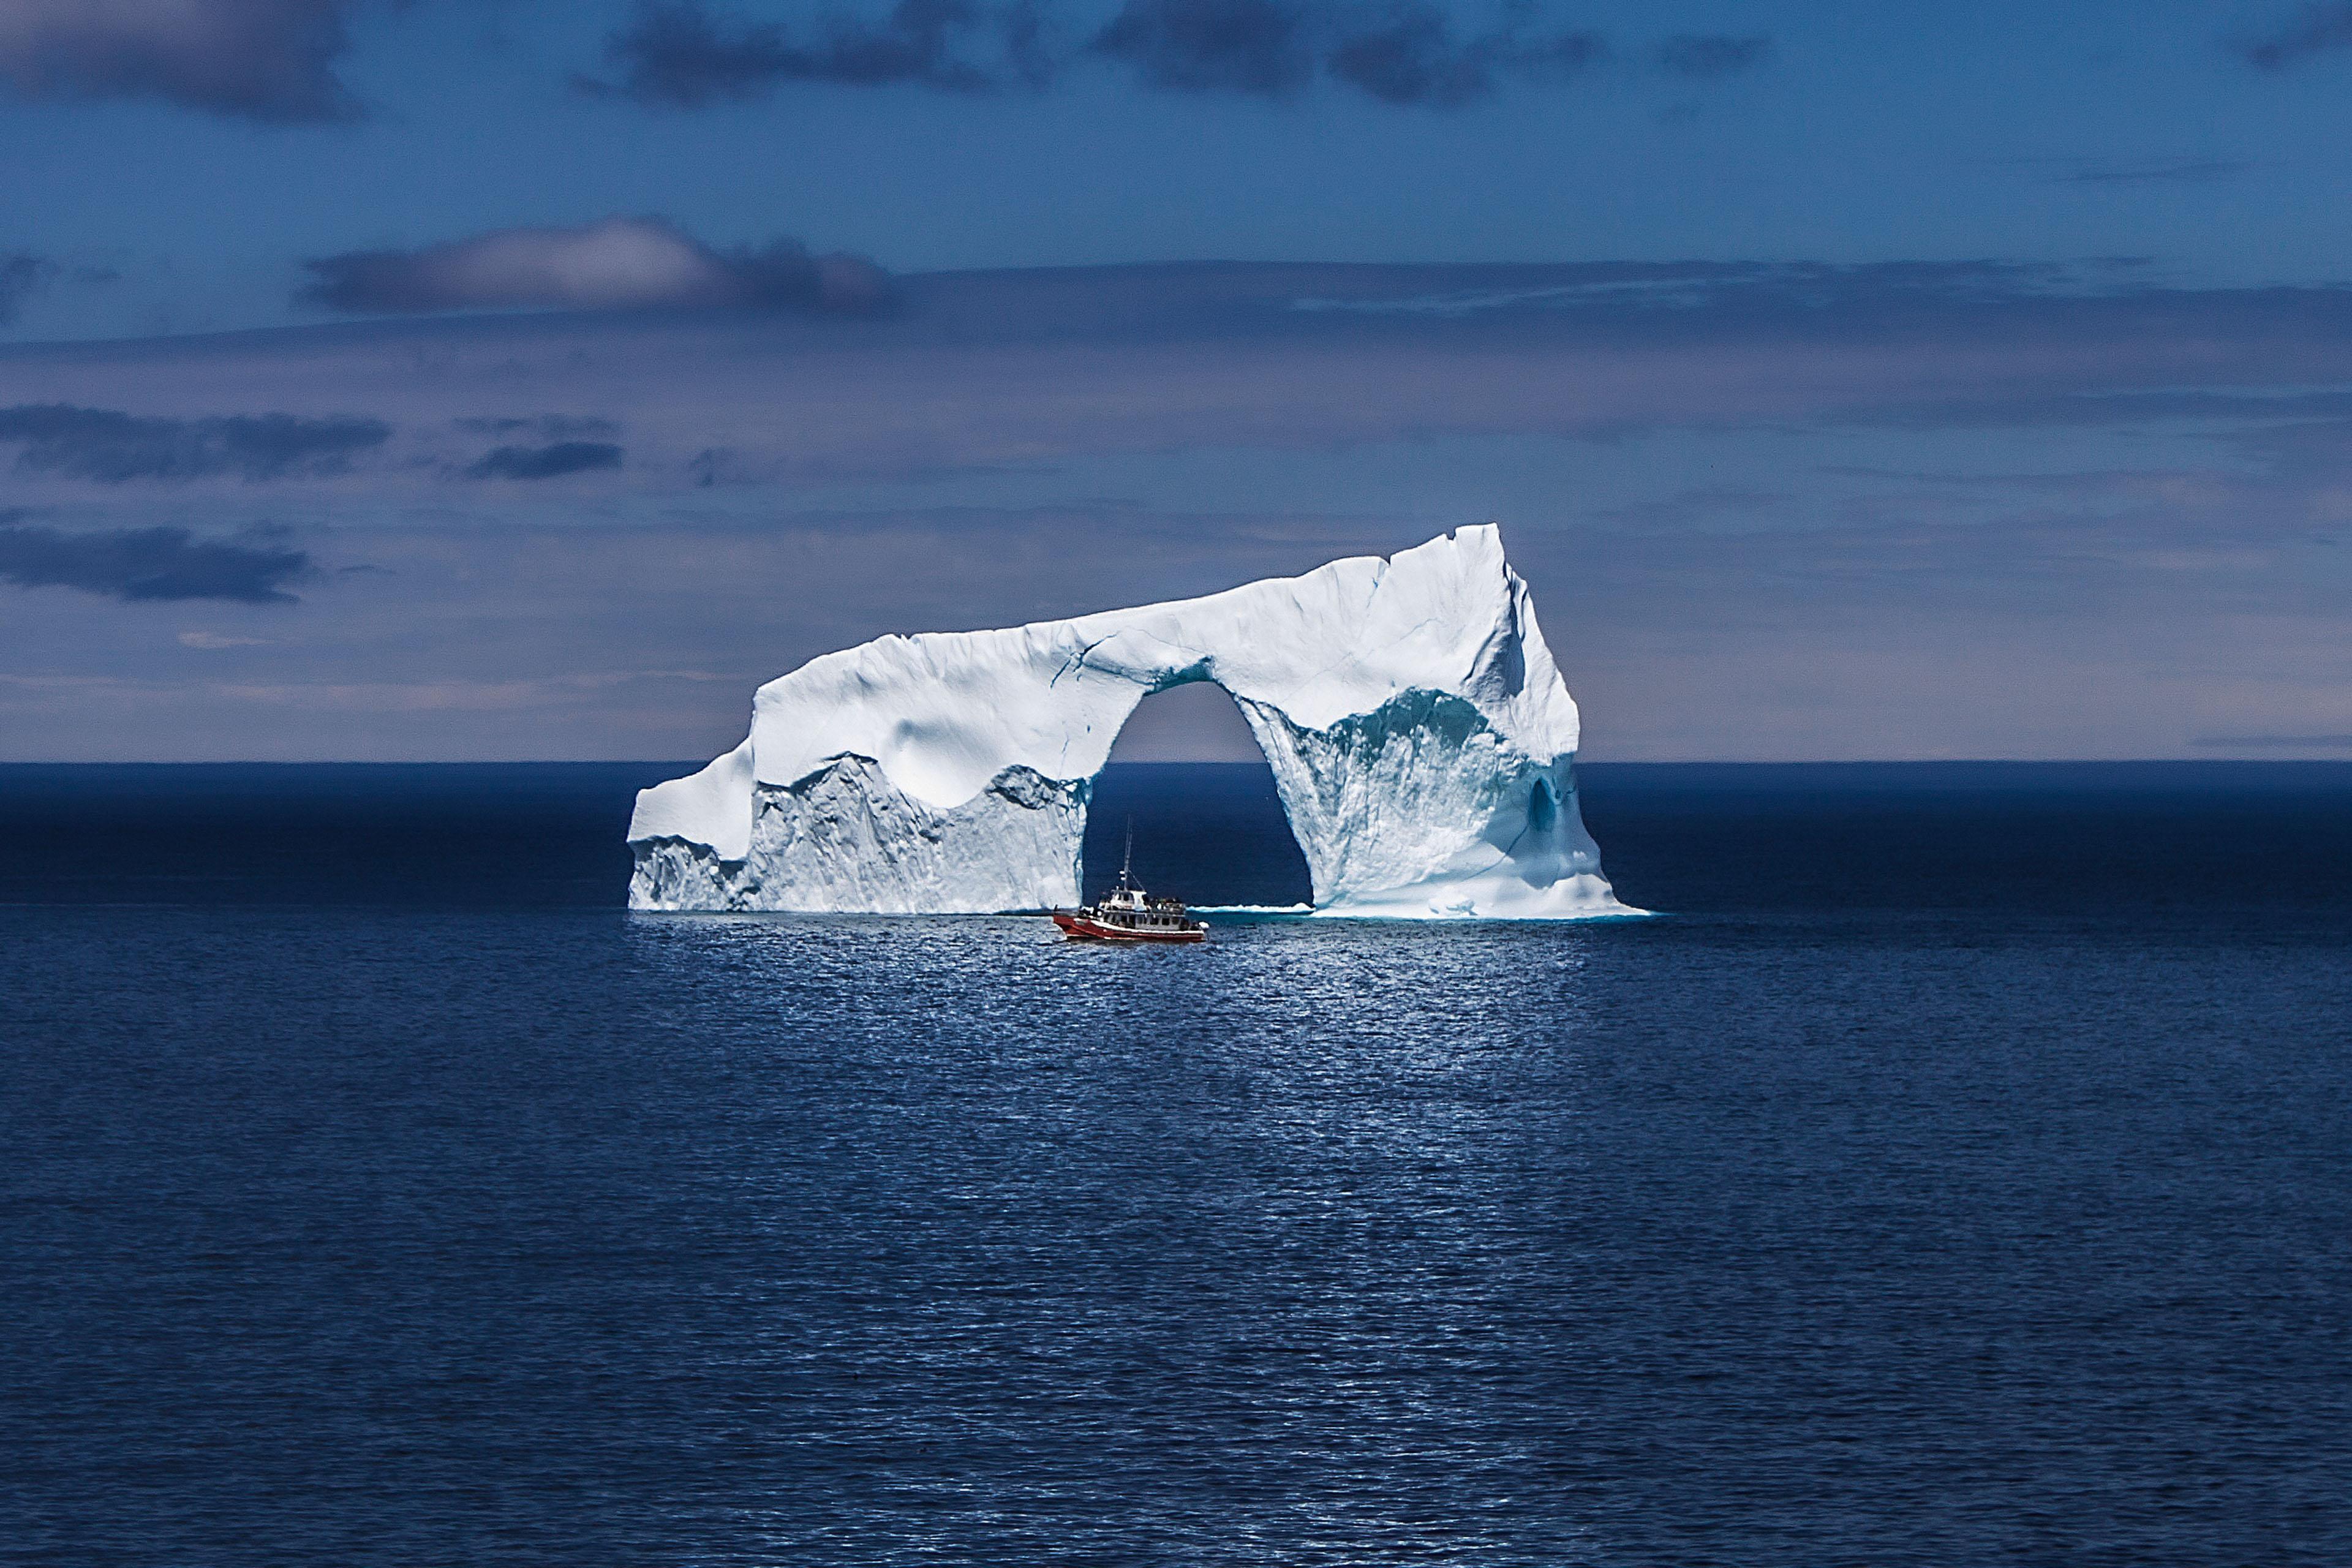 Boat sea iceberg arch image